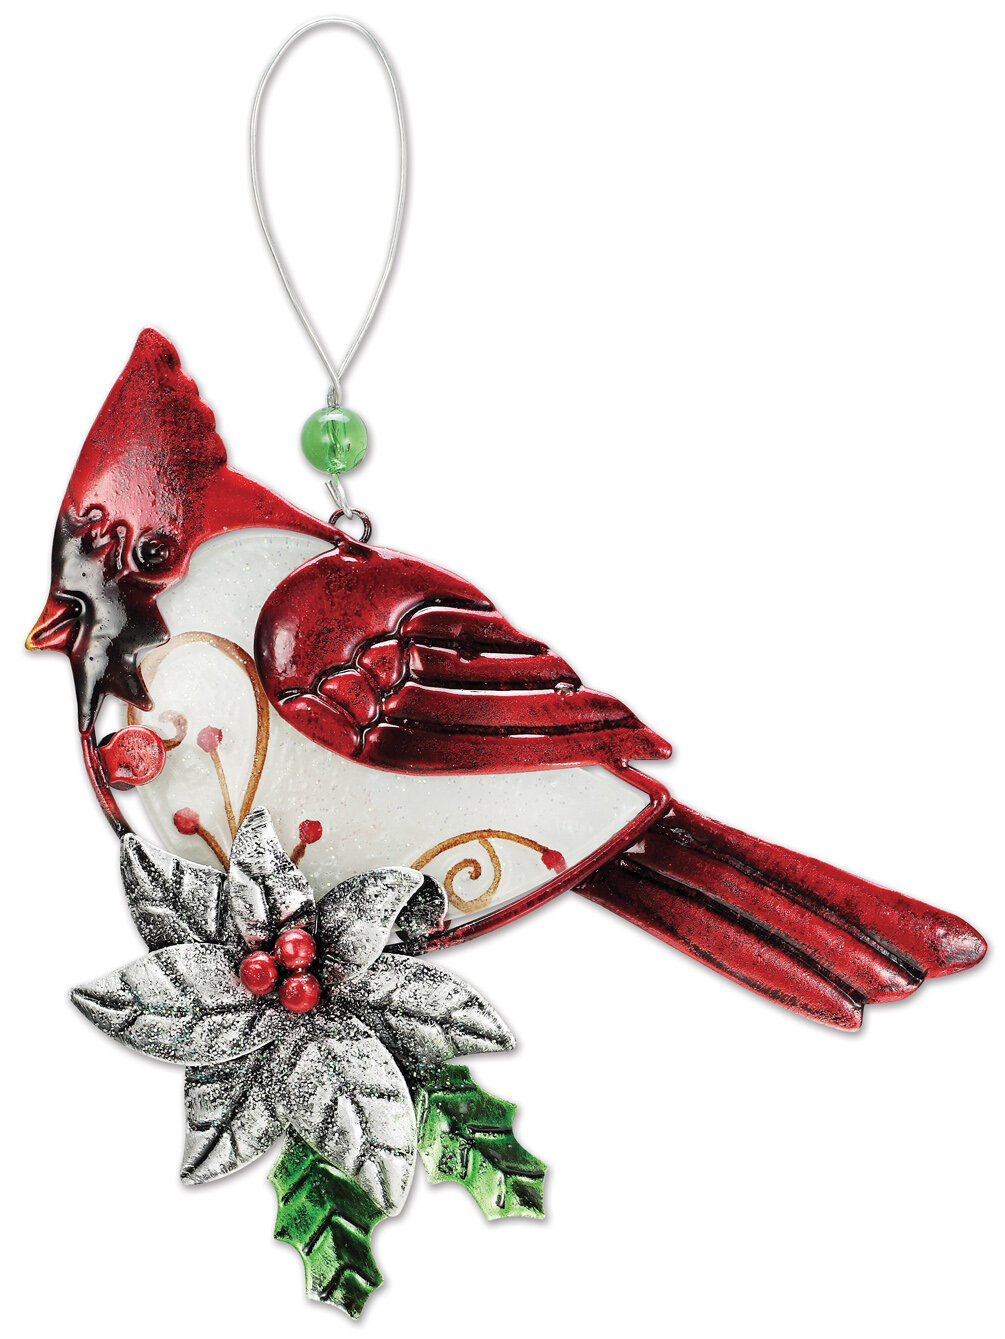 Sunsetvistadesignsco 2 Piece Cardinal Hanging Figurine Ornament Set Wayfair